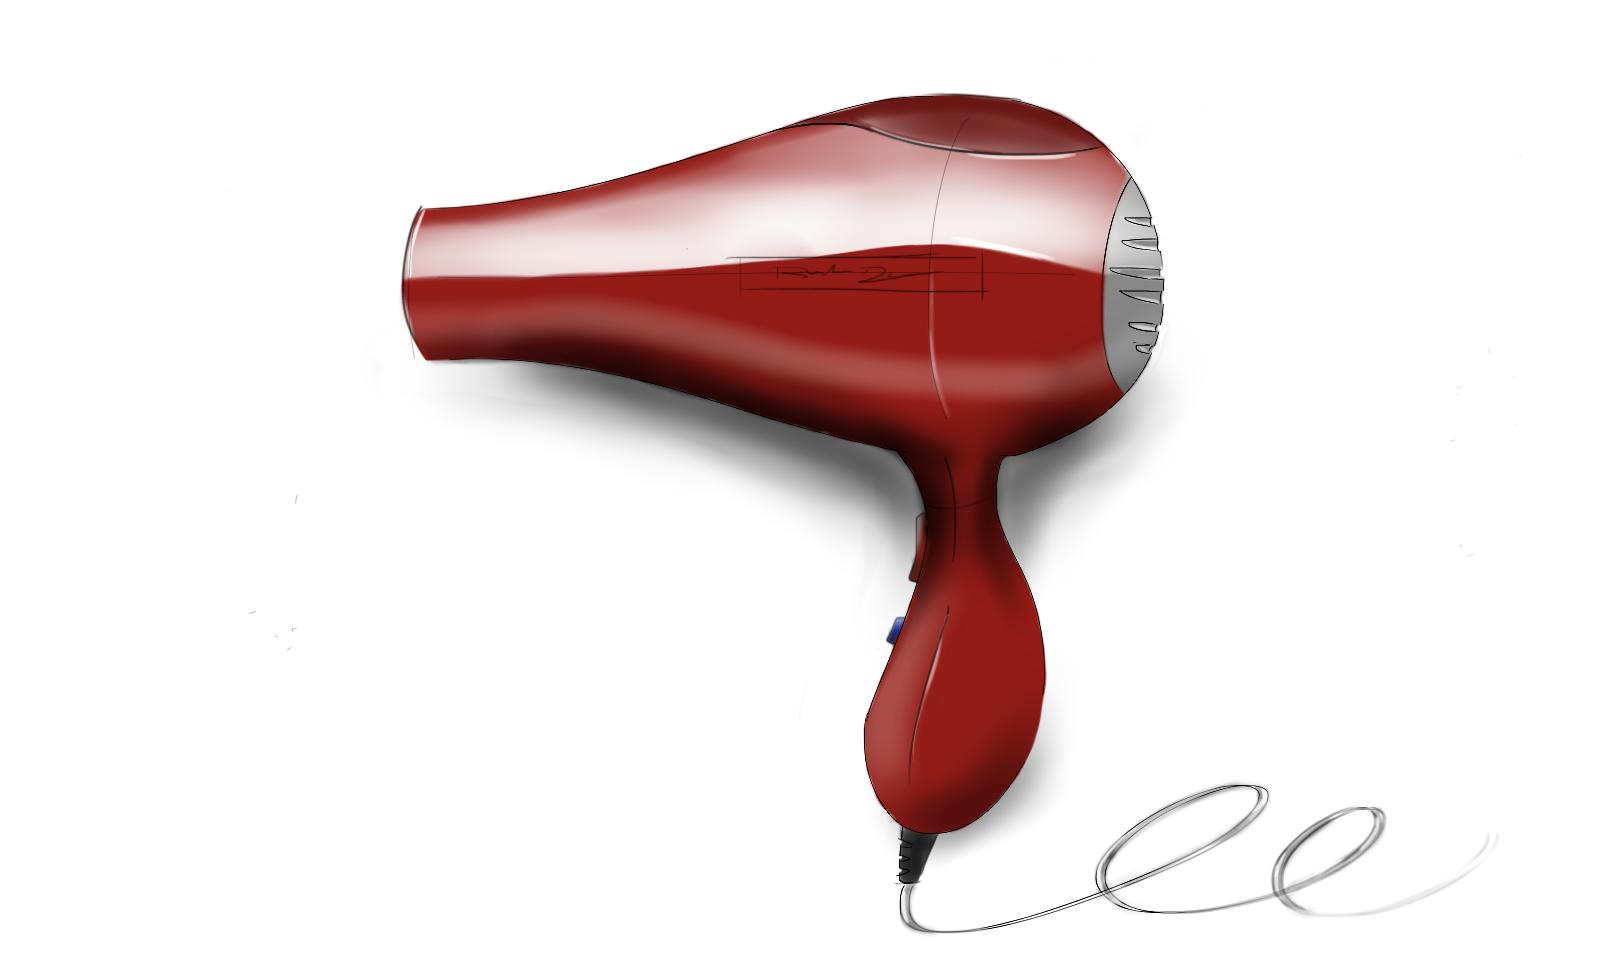 hairdryer1.png